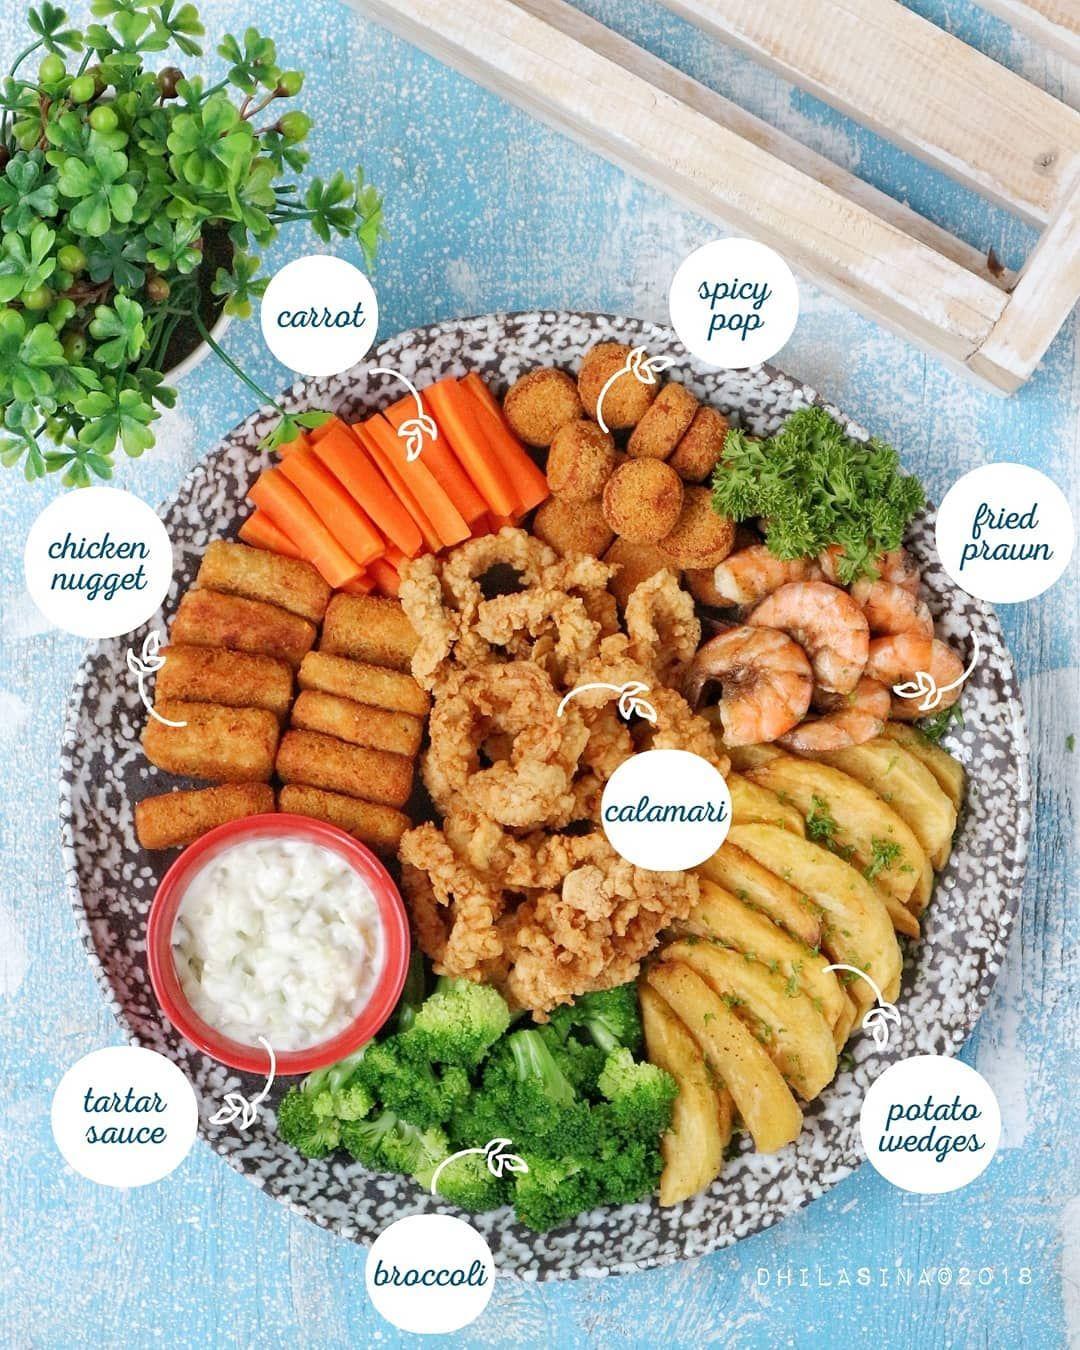 Edit Tulisan Pake Aplikasi Phonto Assalamu Alaykum Gemowniiiing Perlu Ide Masak Makan Cepat Lagi Gaaa Mix Platter Ka Makanan Cepat Makanan Resep